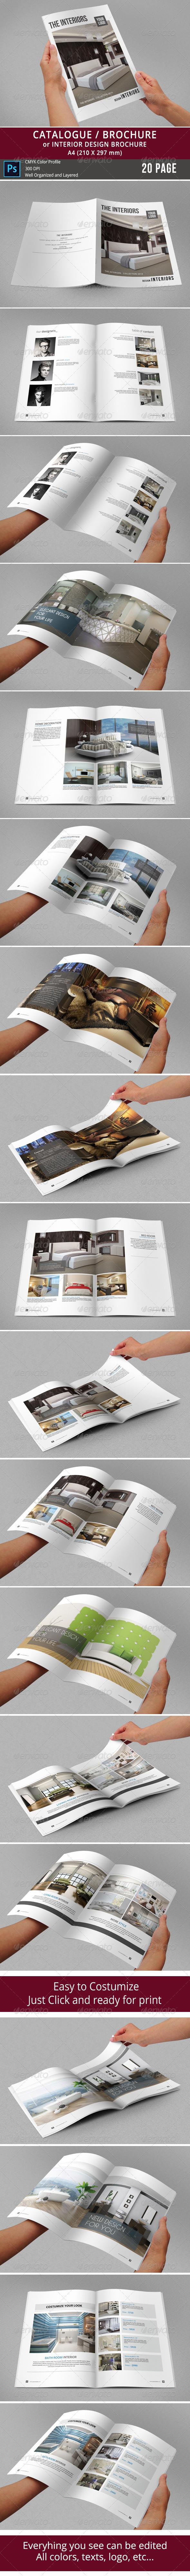 GraphicRiver Catalogue Brochure 8070658